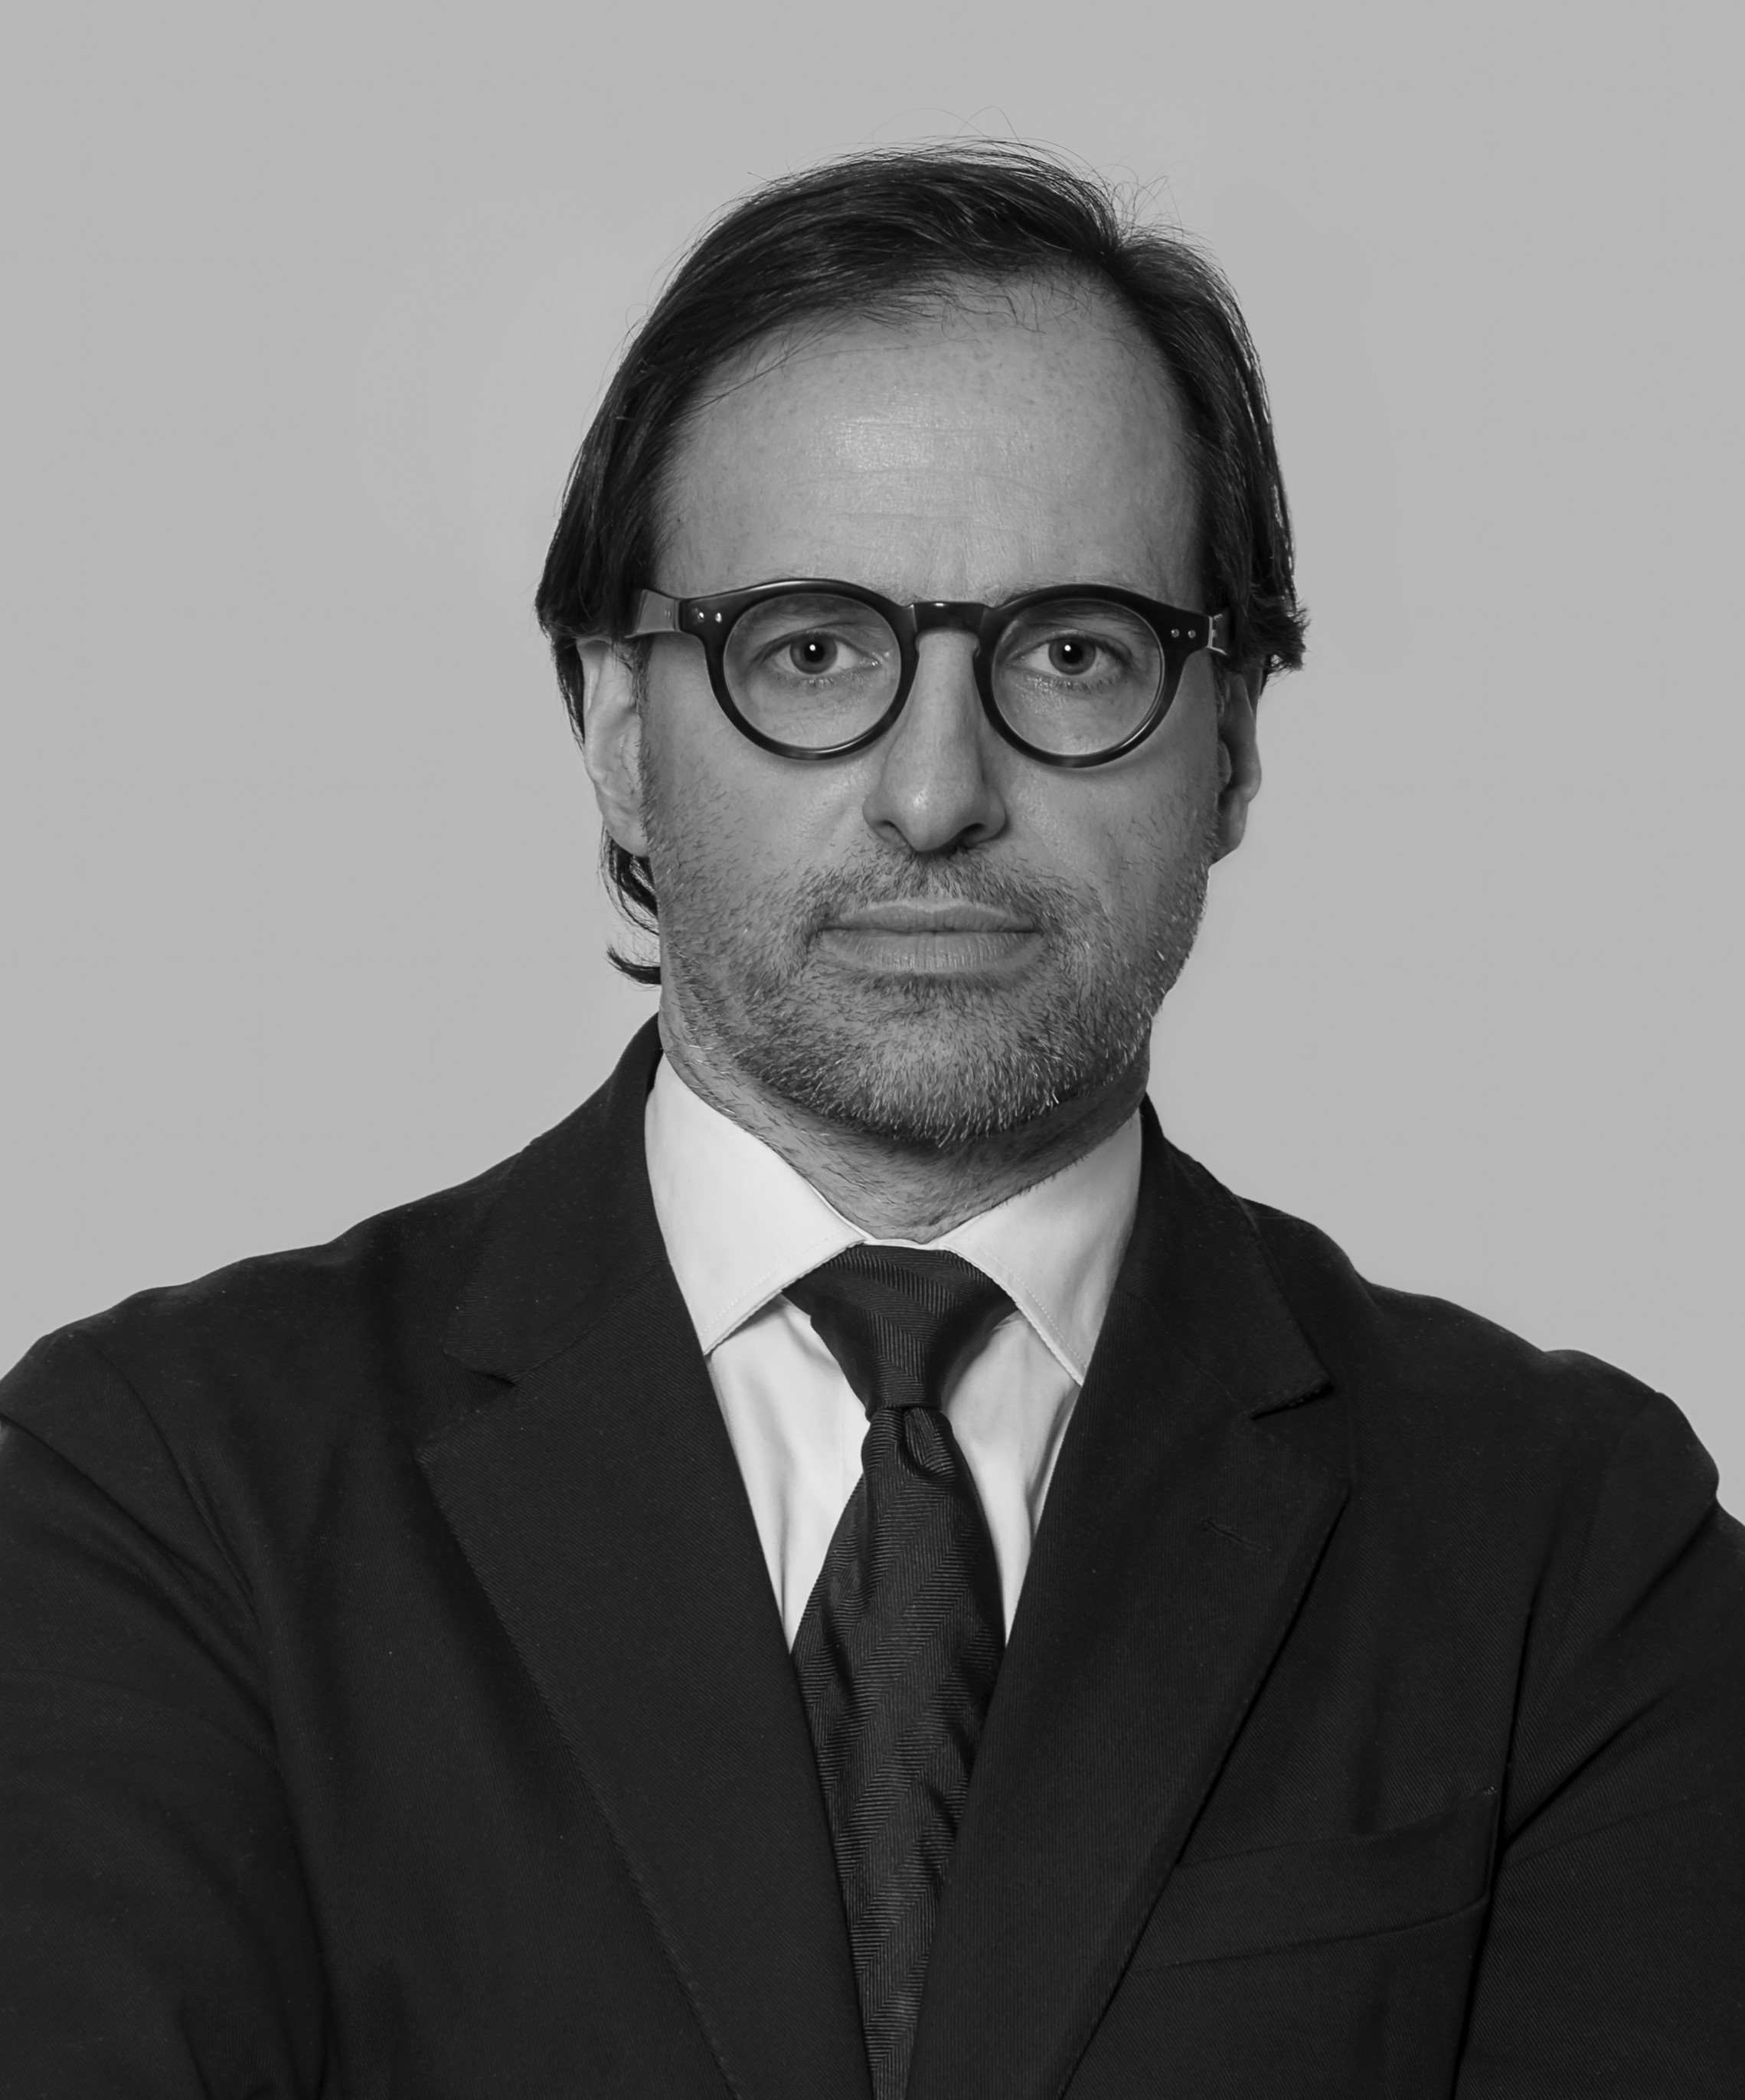 Teymur D. Khanmoradi